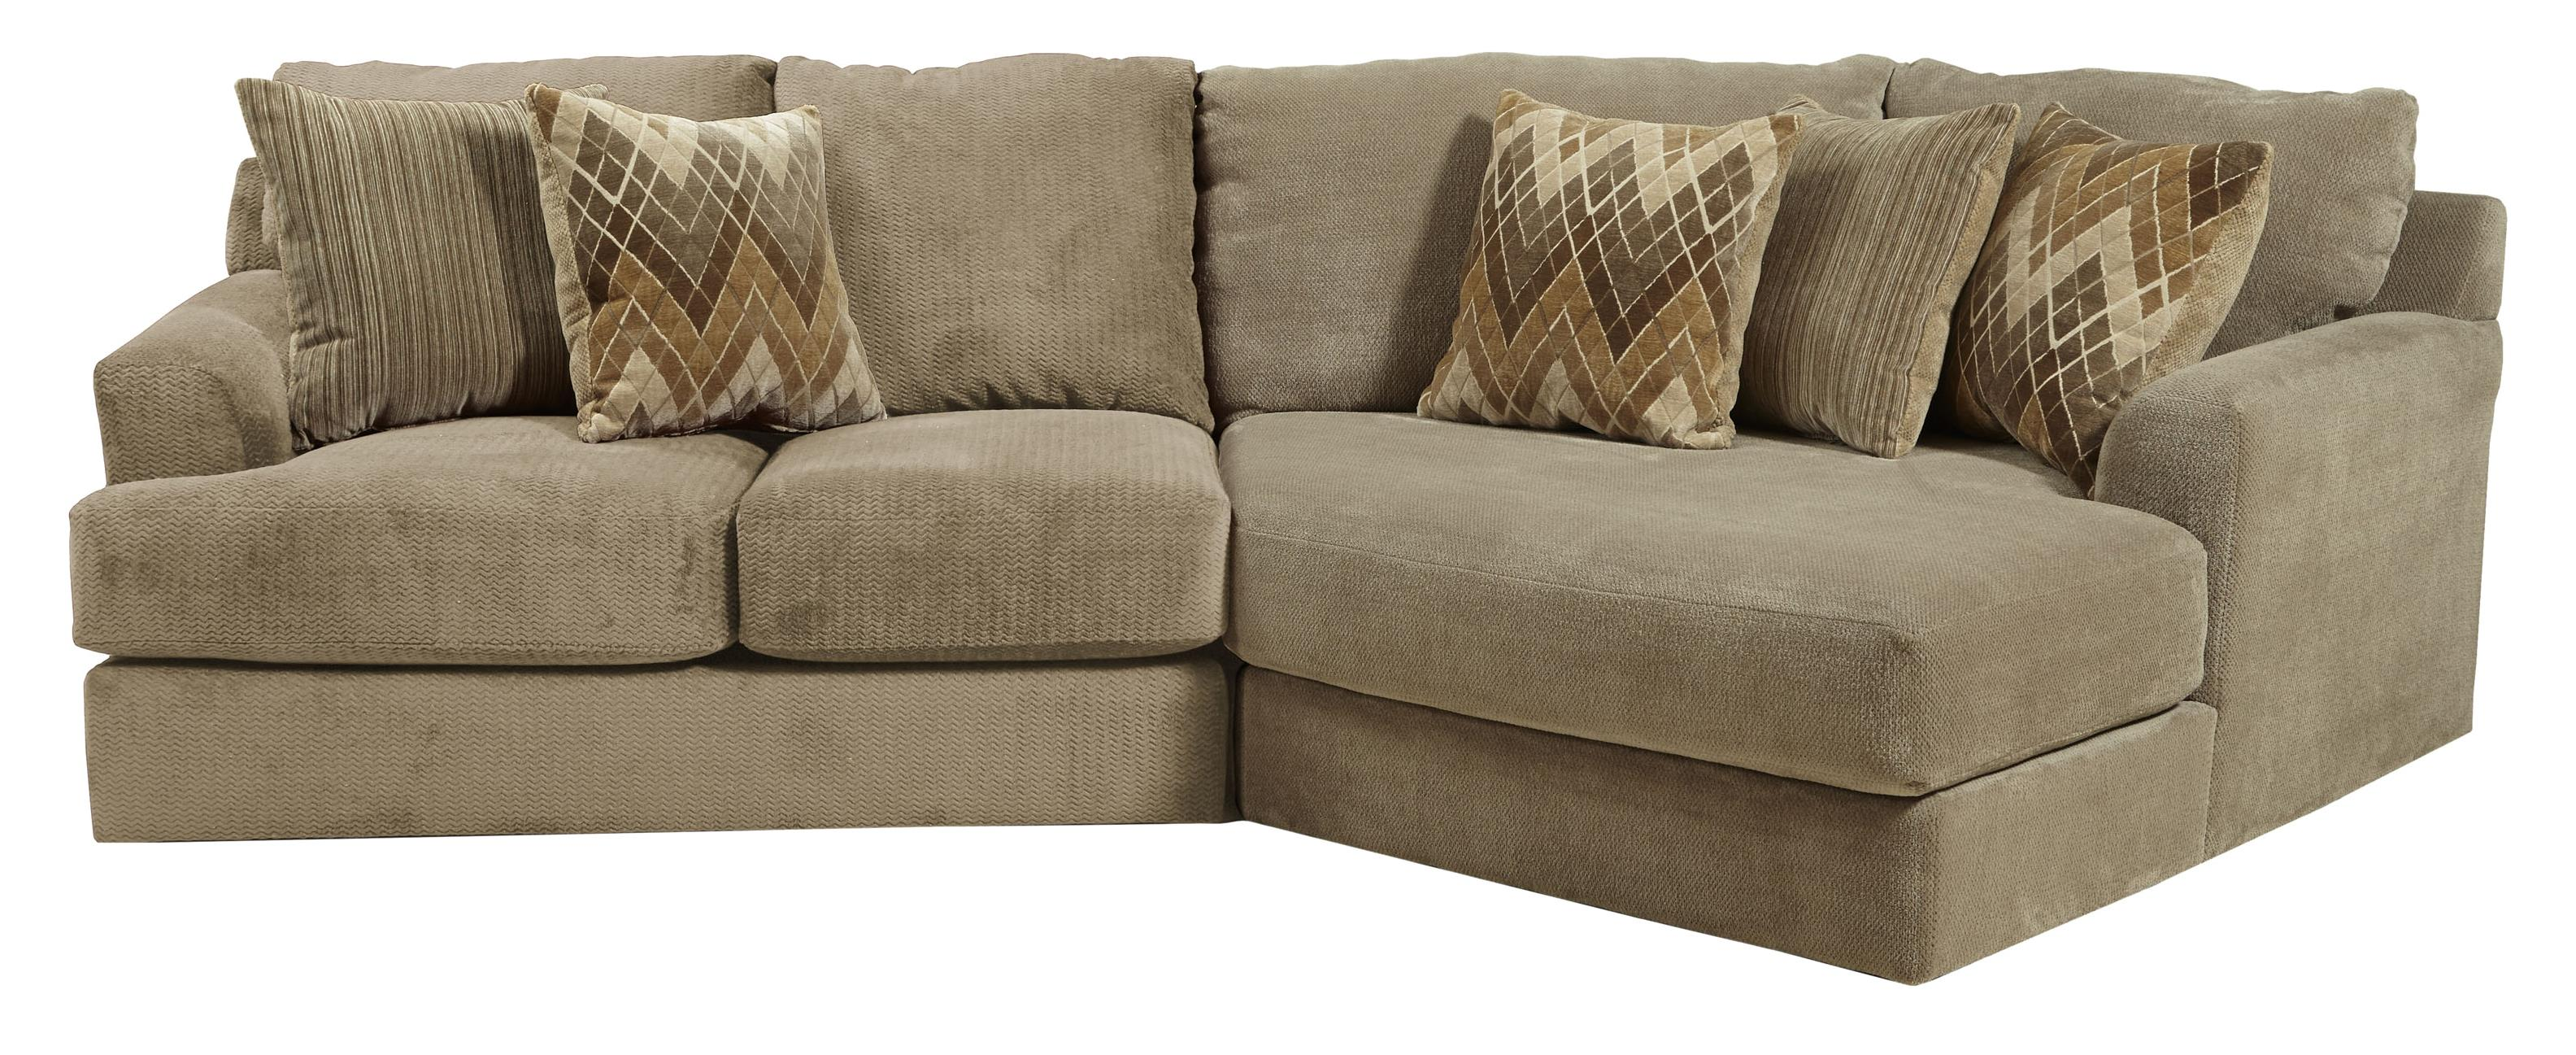 Jackson Furniture Malibu Small Three Seat Sectional Sofa